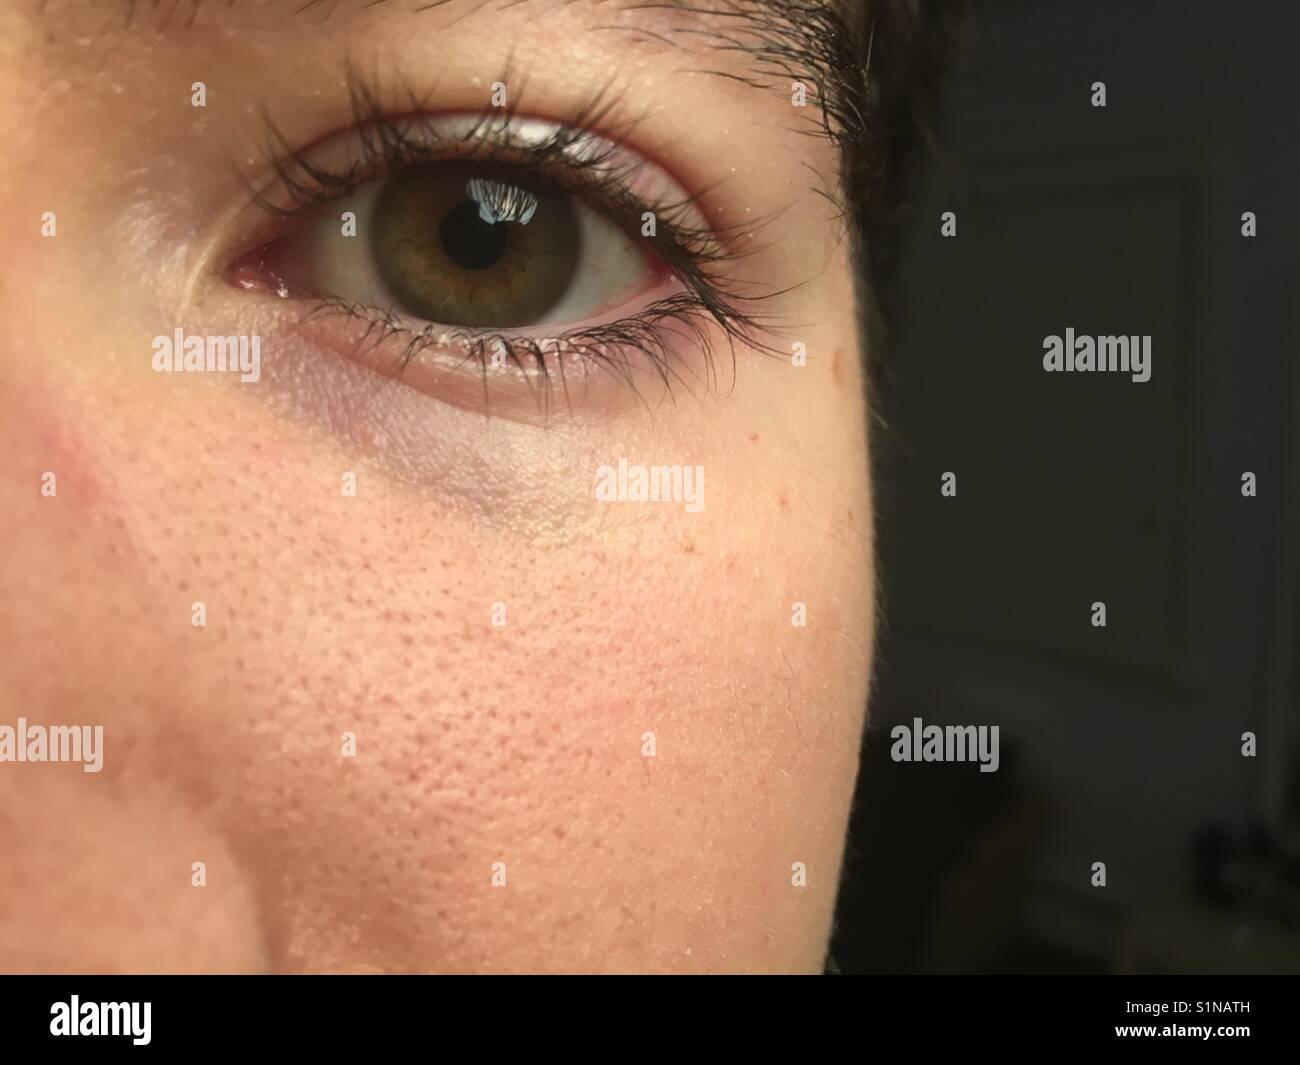 Half of man's face showing eye. - Stock Image